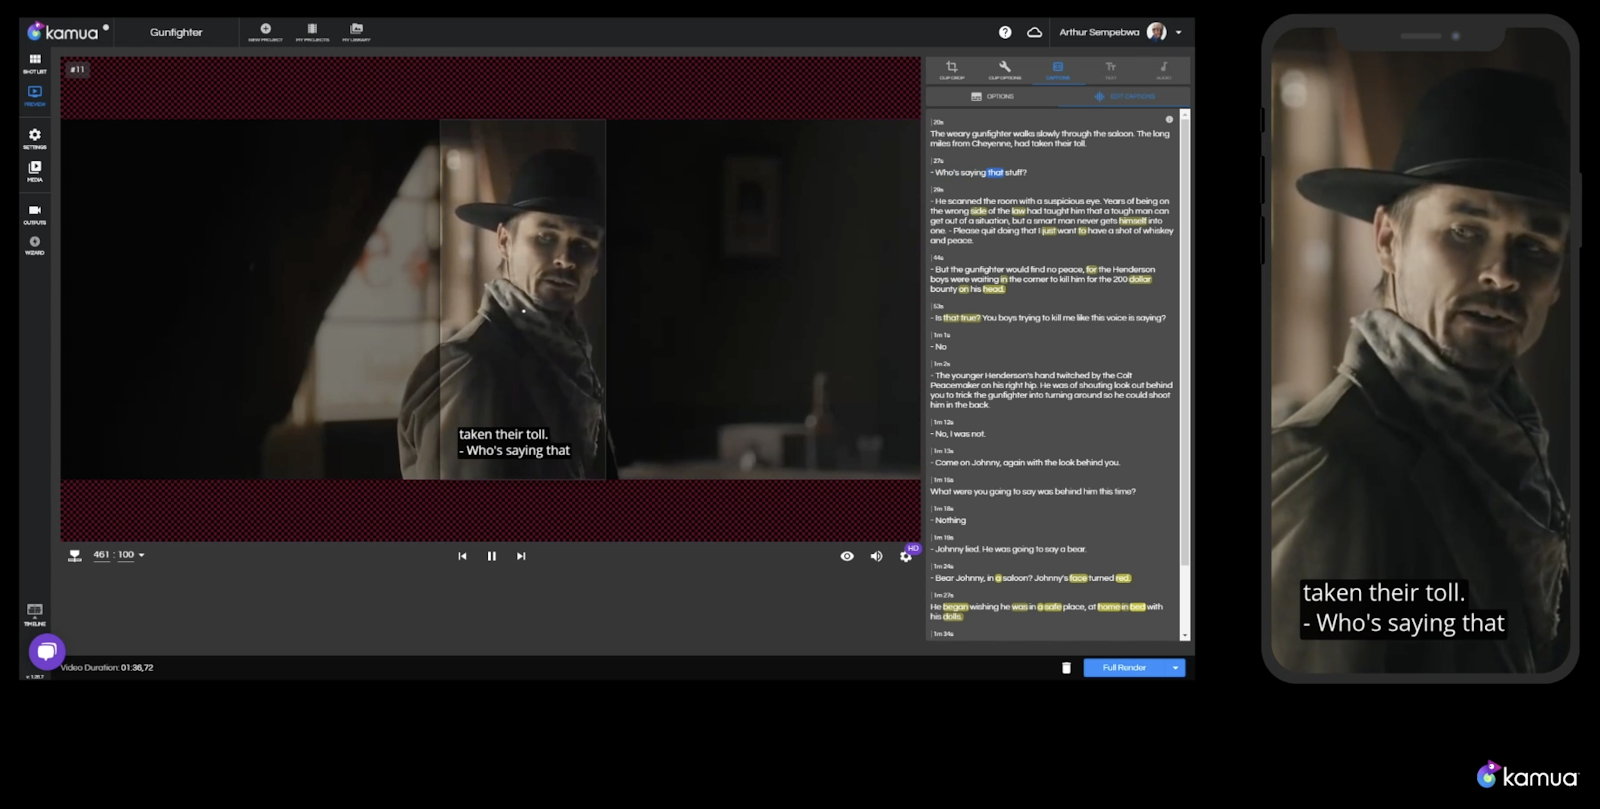 Kamua's editing features